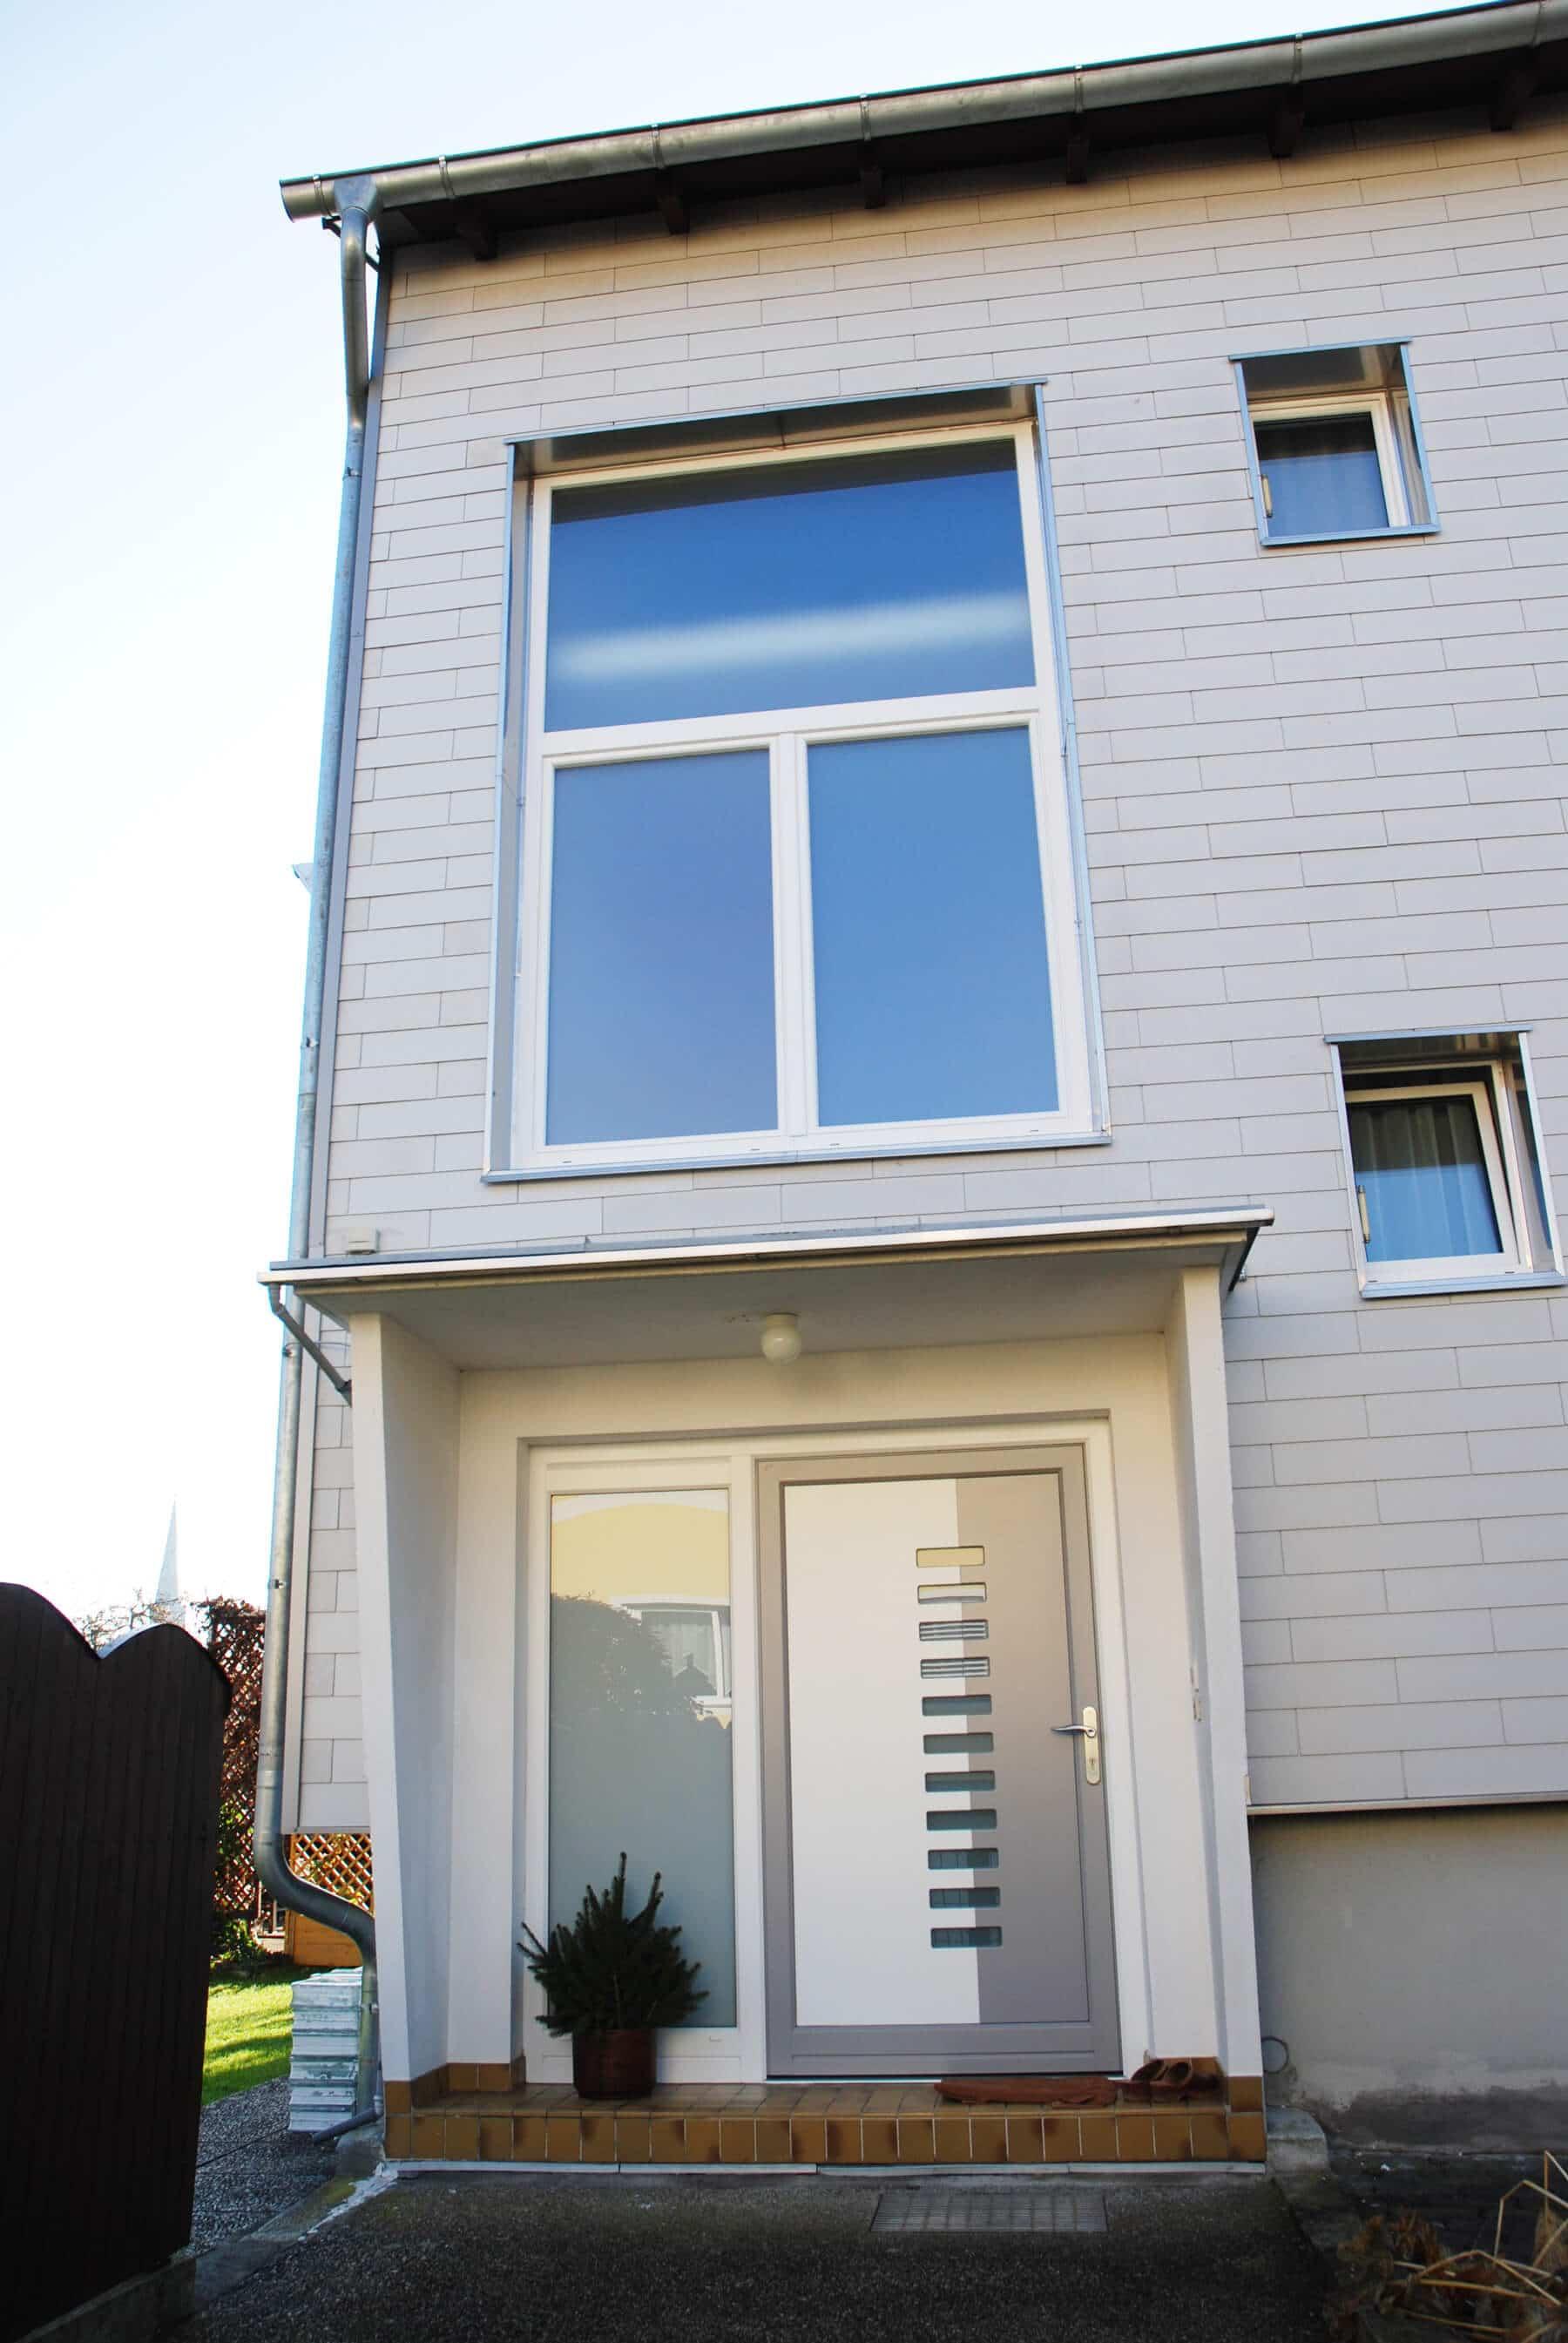 Stiegenhausfenster und Aluminium-Türe